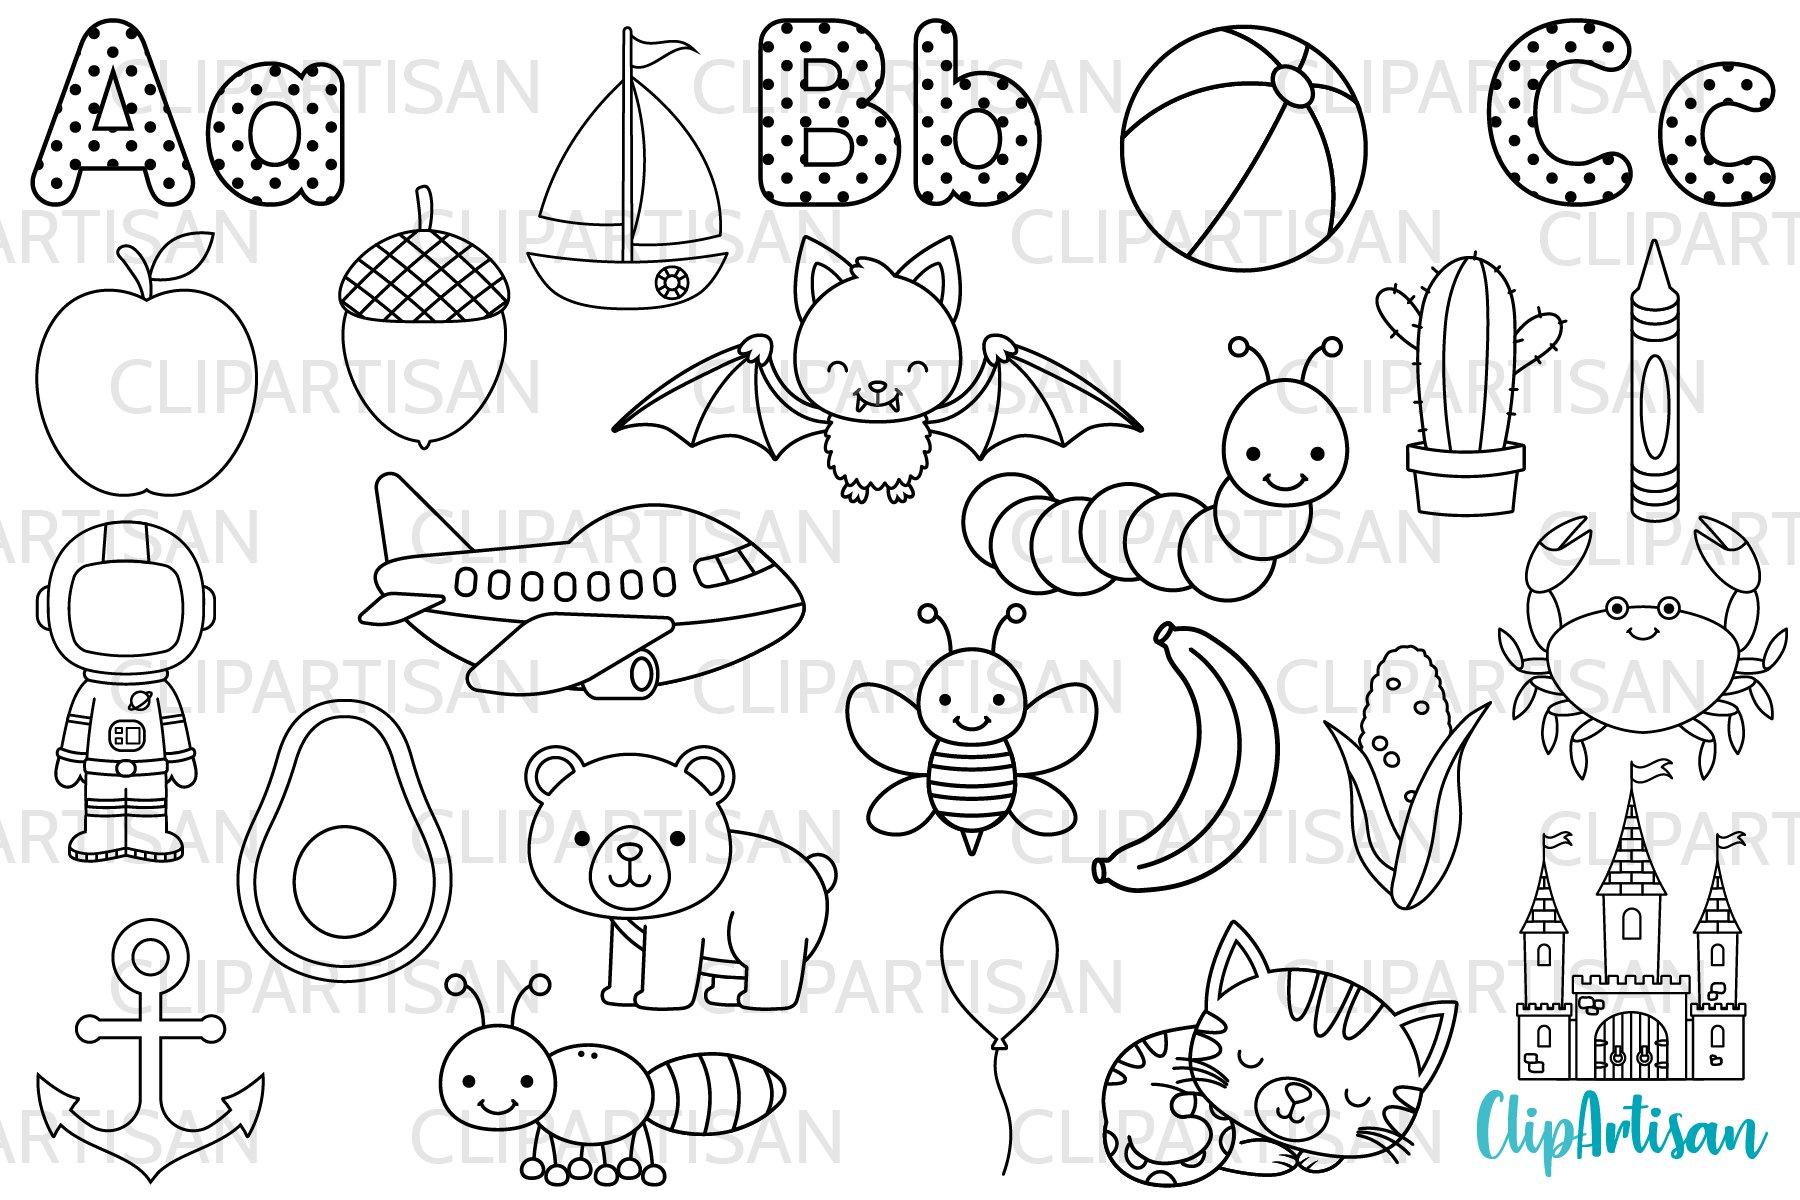 Alphabet Clip Art, ABC Illustrations, Digital Stamps